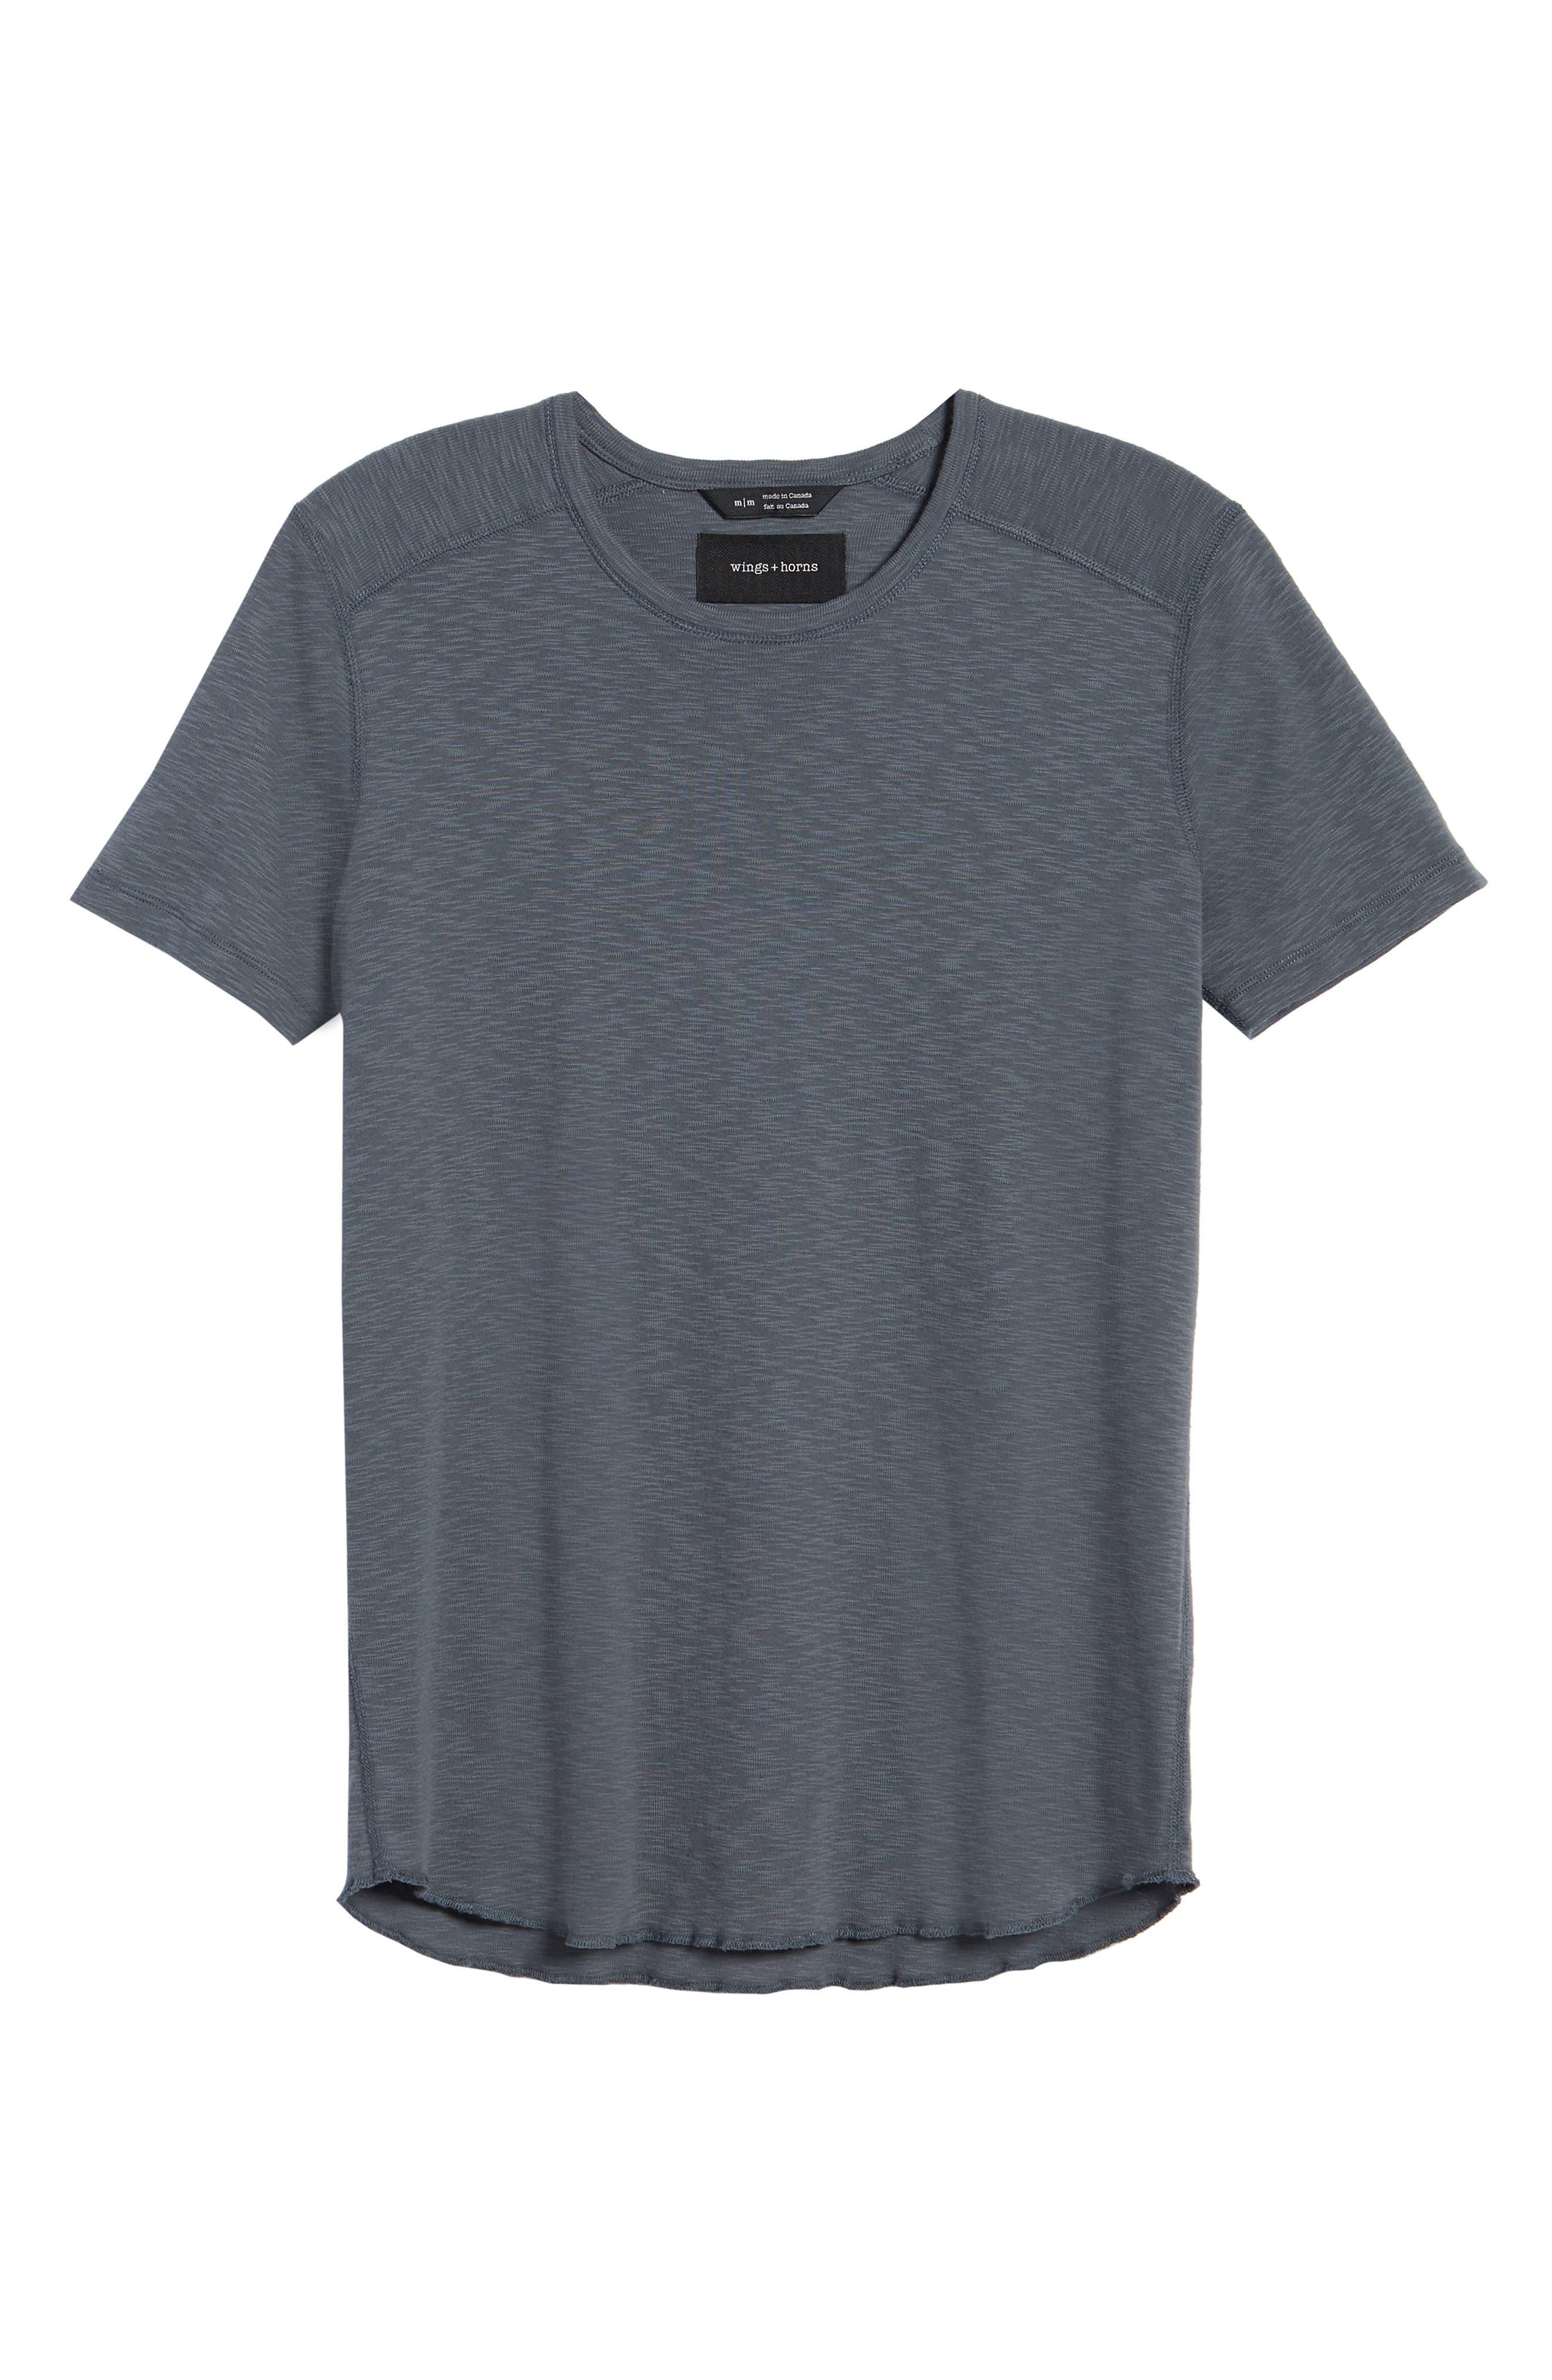 WINGS + HORNS, Ribbed Slub Cotton T-Shirt, Alternate thumbnail 6, color, SHADOW